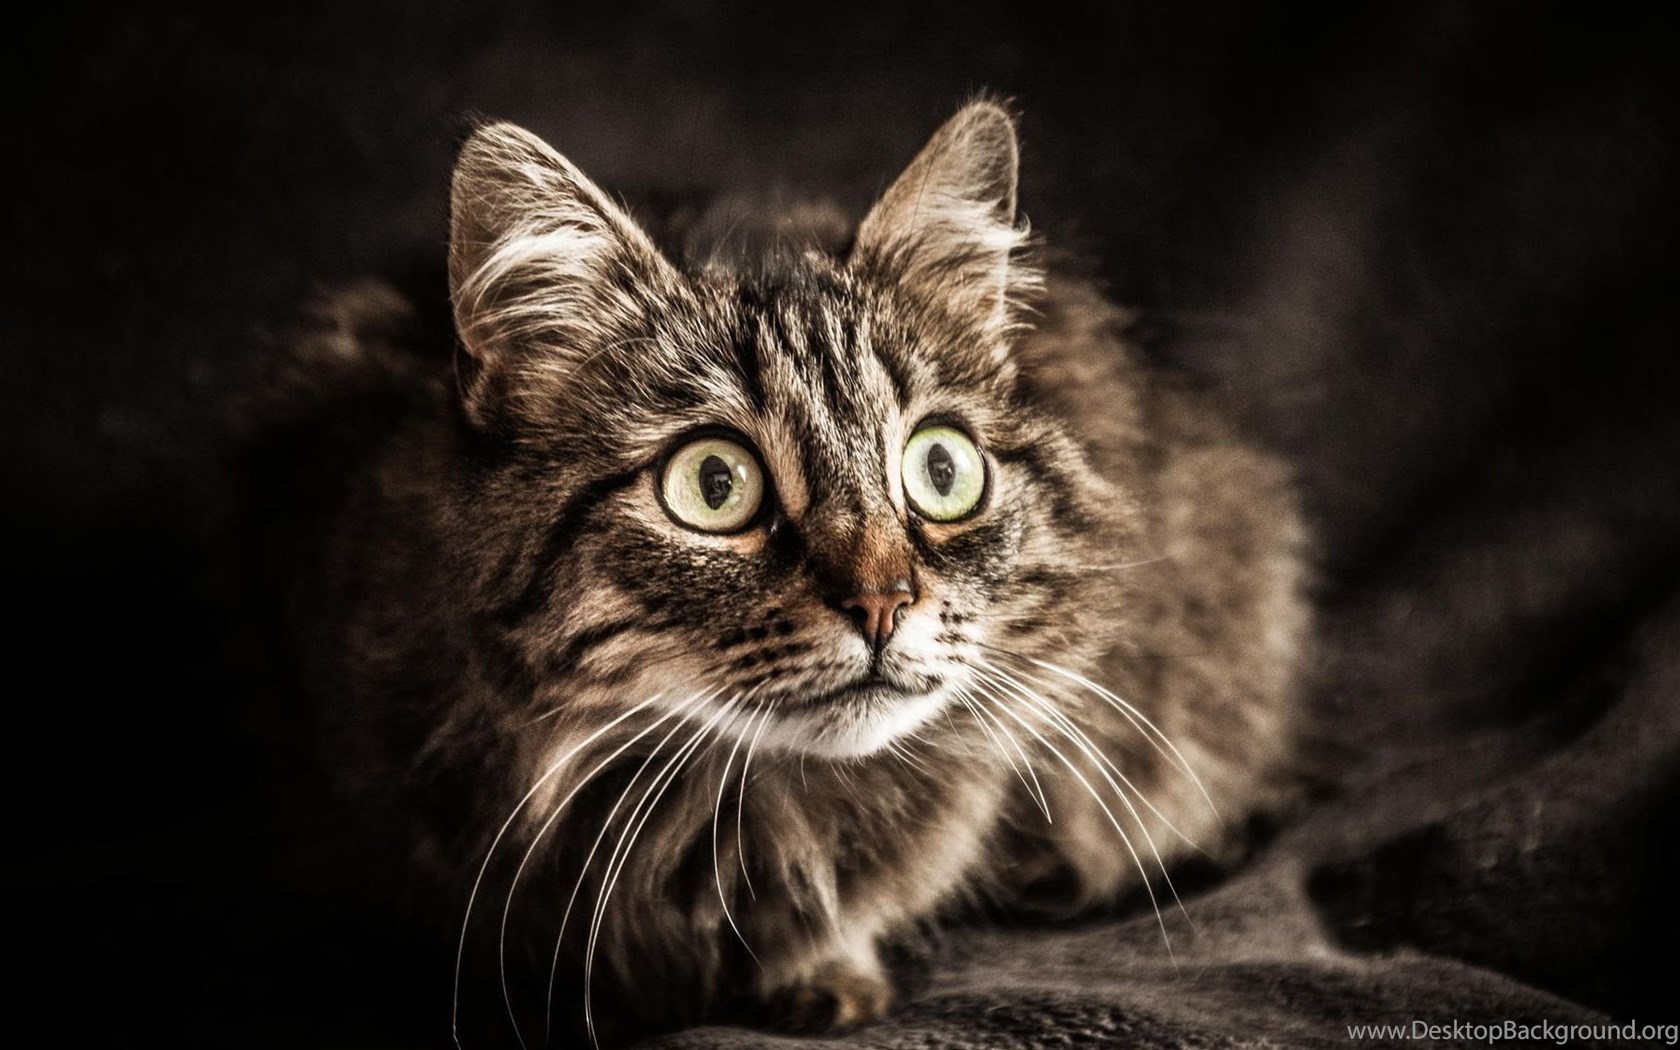 Unduh 42 Koleksi Wallpaper Hd Cat HD Gratid